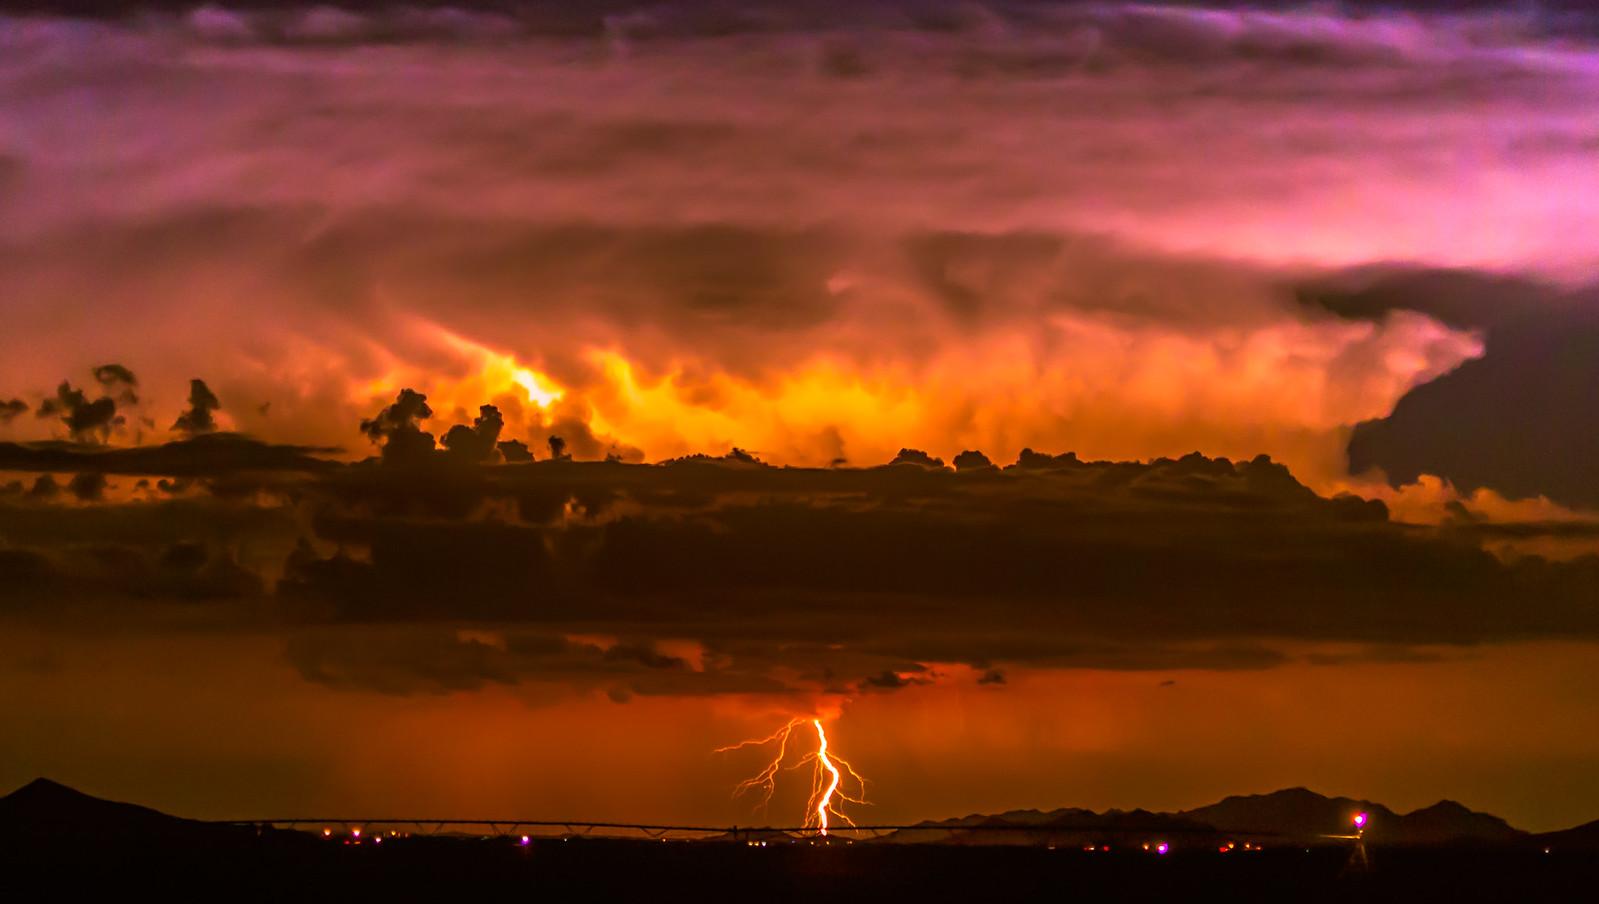 Lighting the Sky